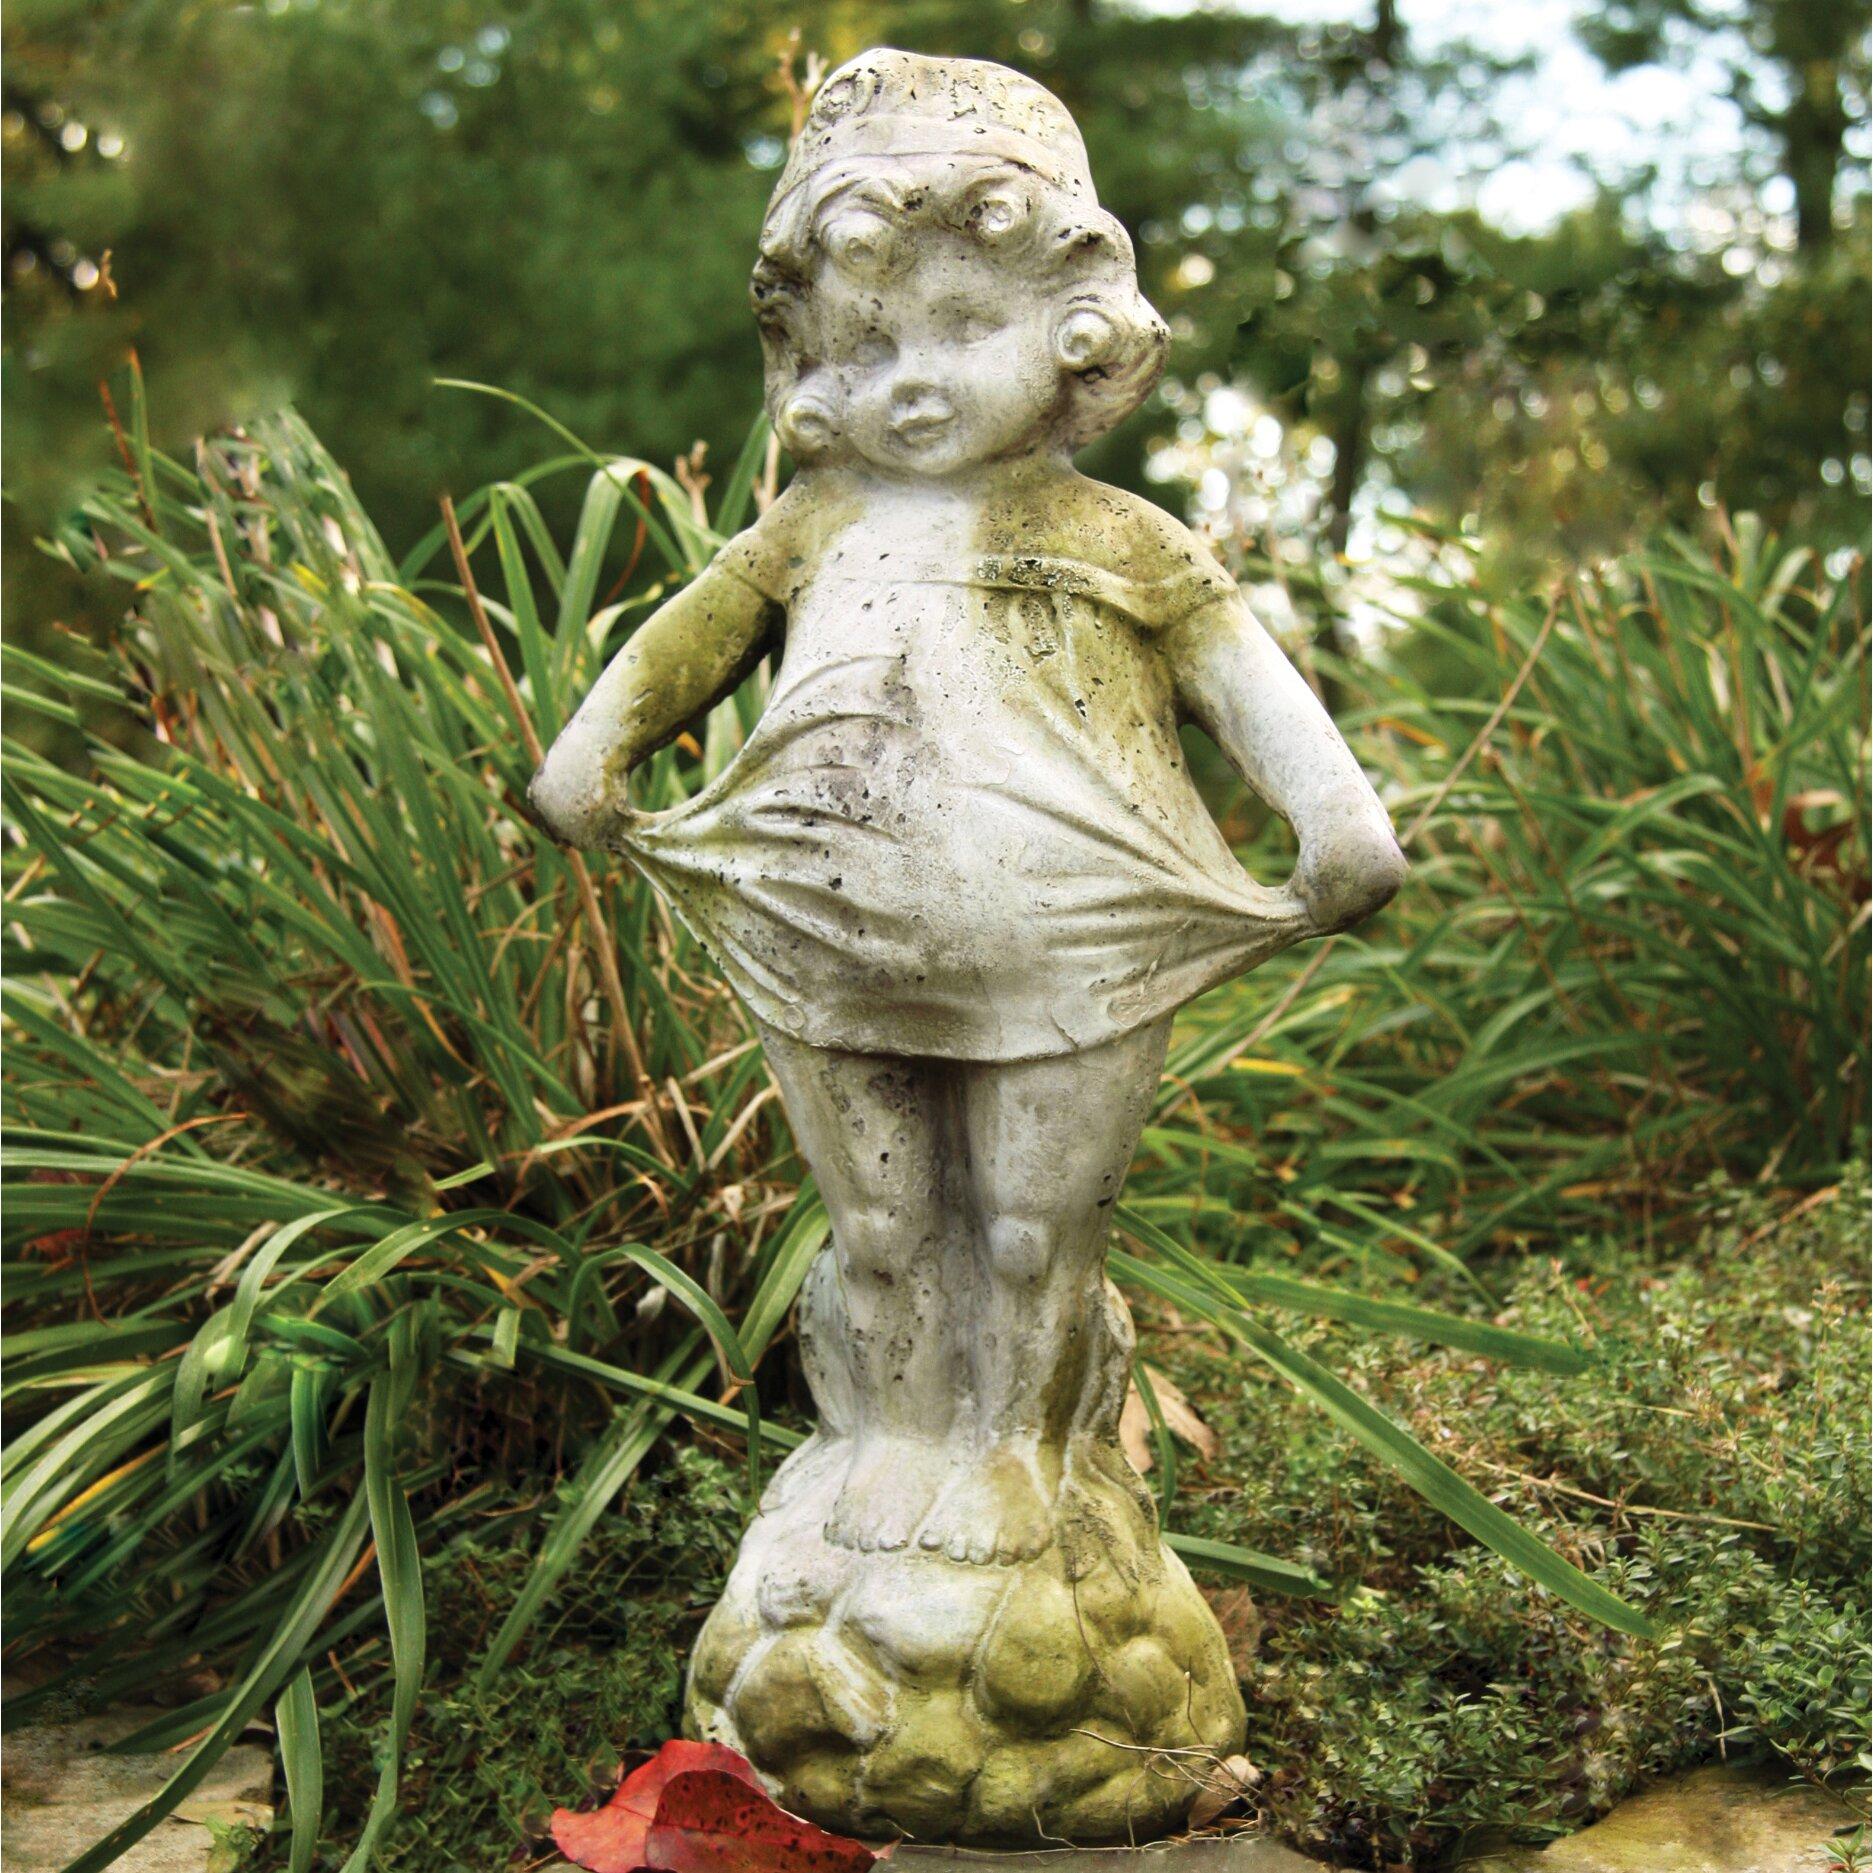 Orlandistatuary Children Little Sister Outdoor Statue